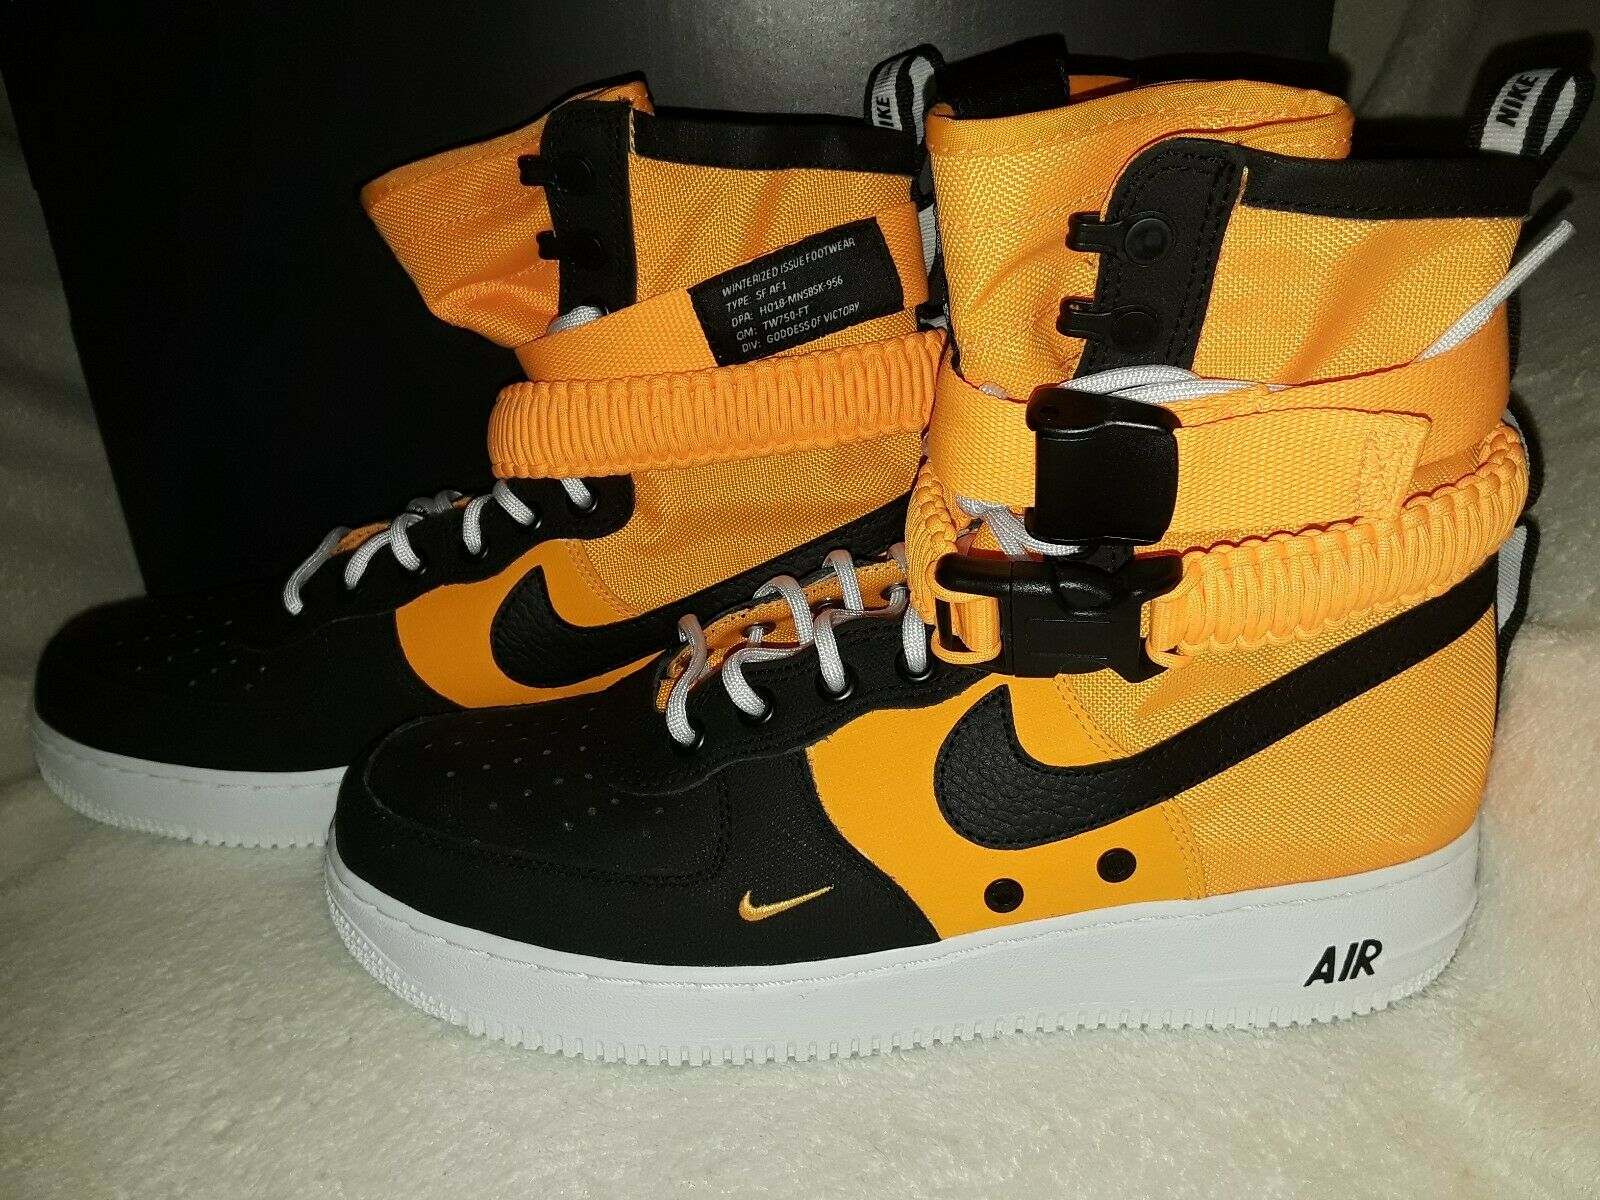 Nike SF Air Force 1 Mens 10 shoes Basketball Laser orange Black 864024 800